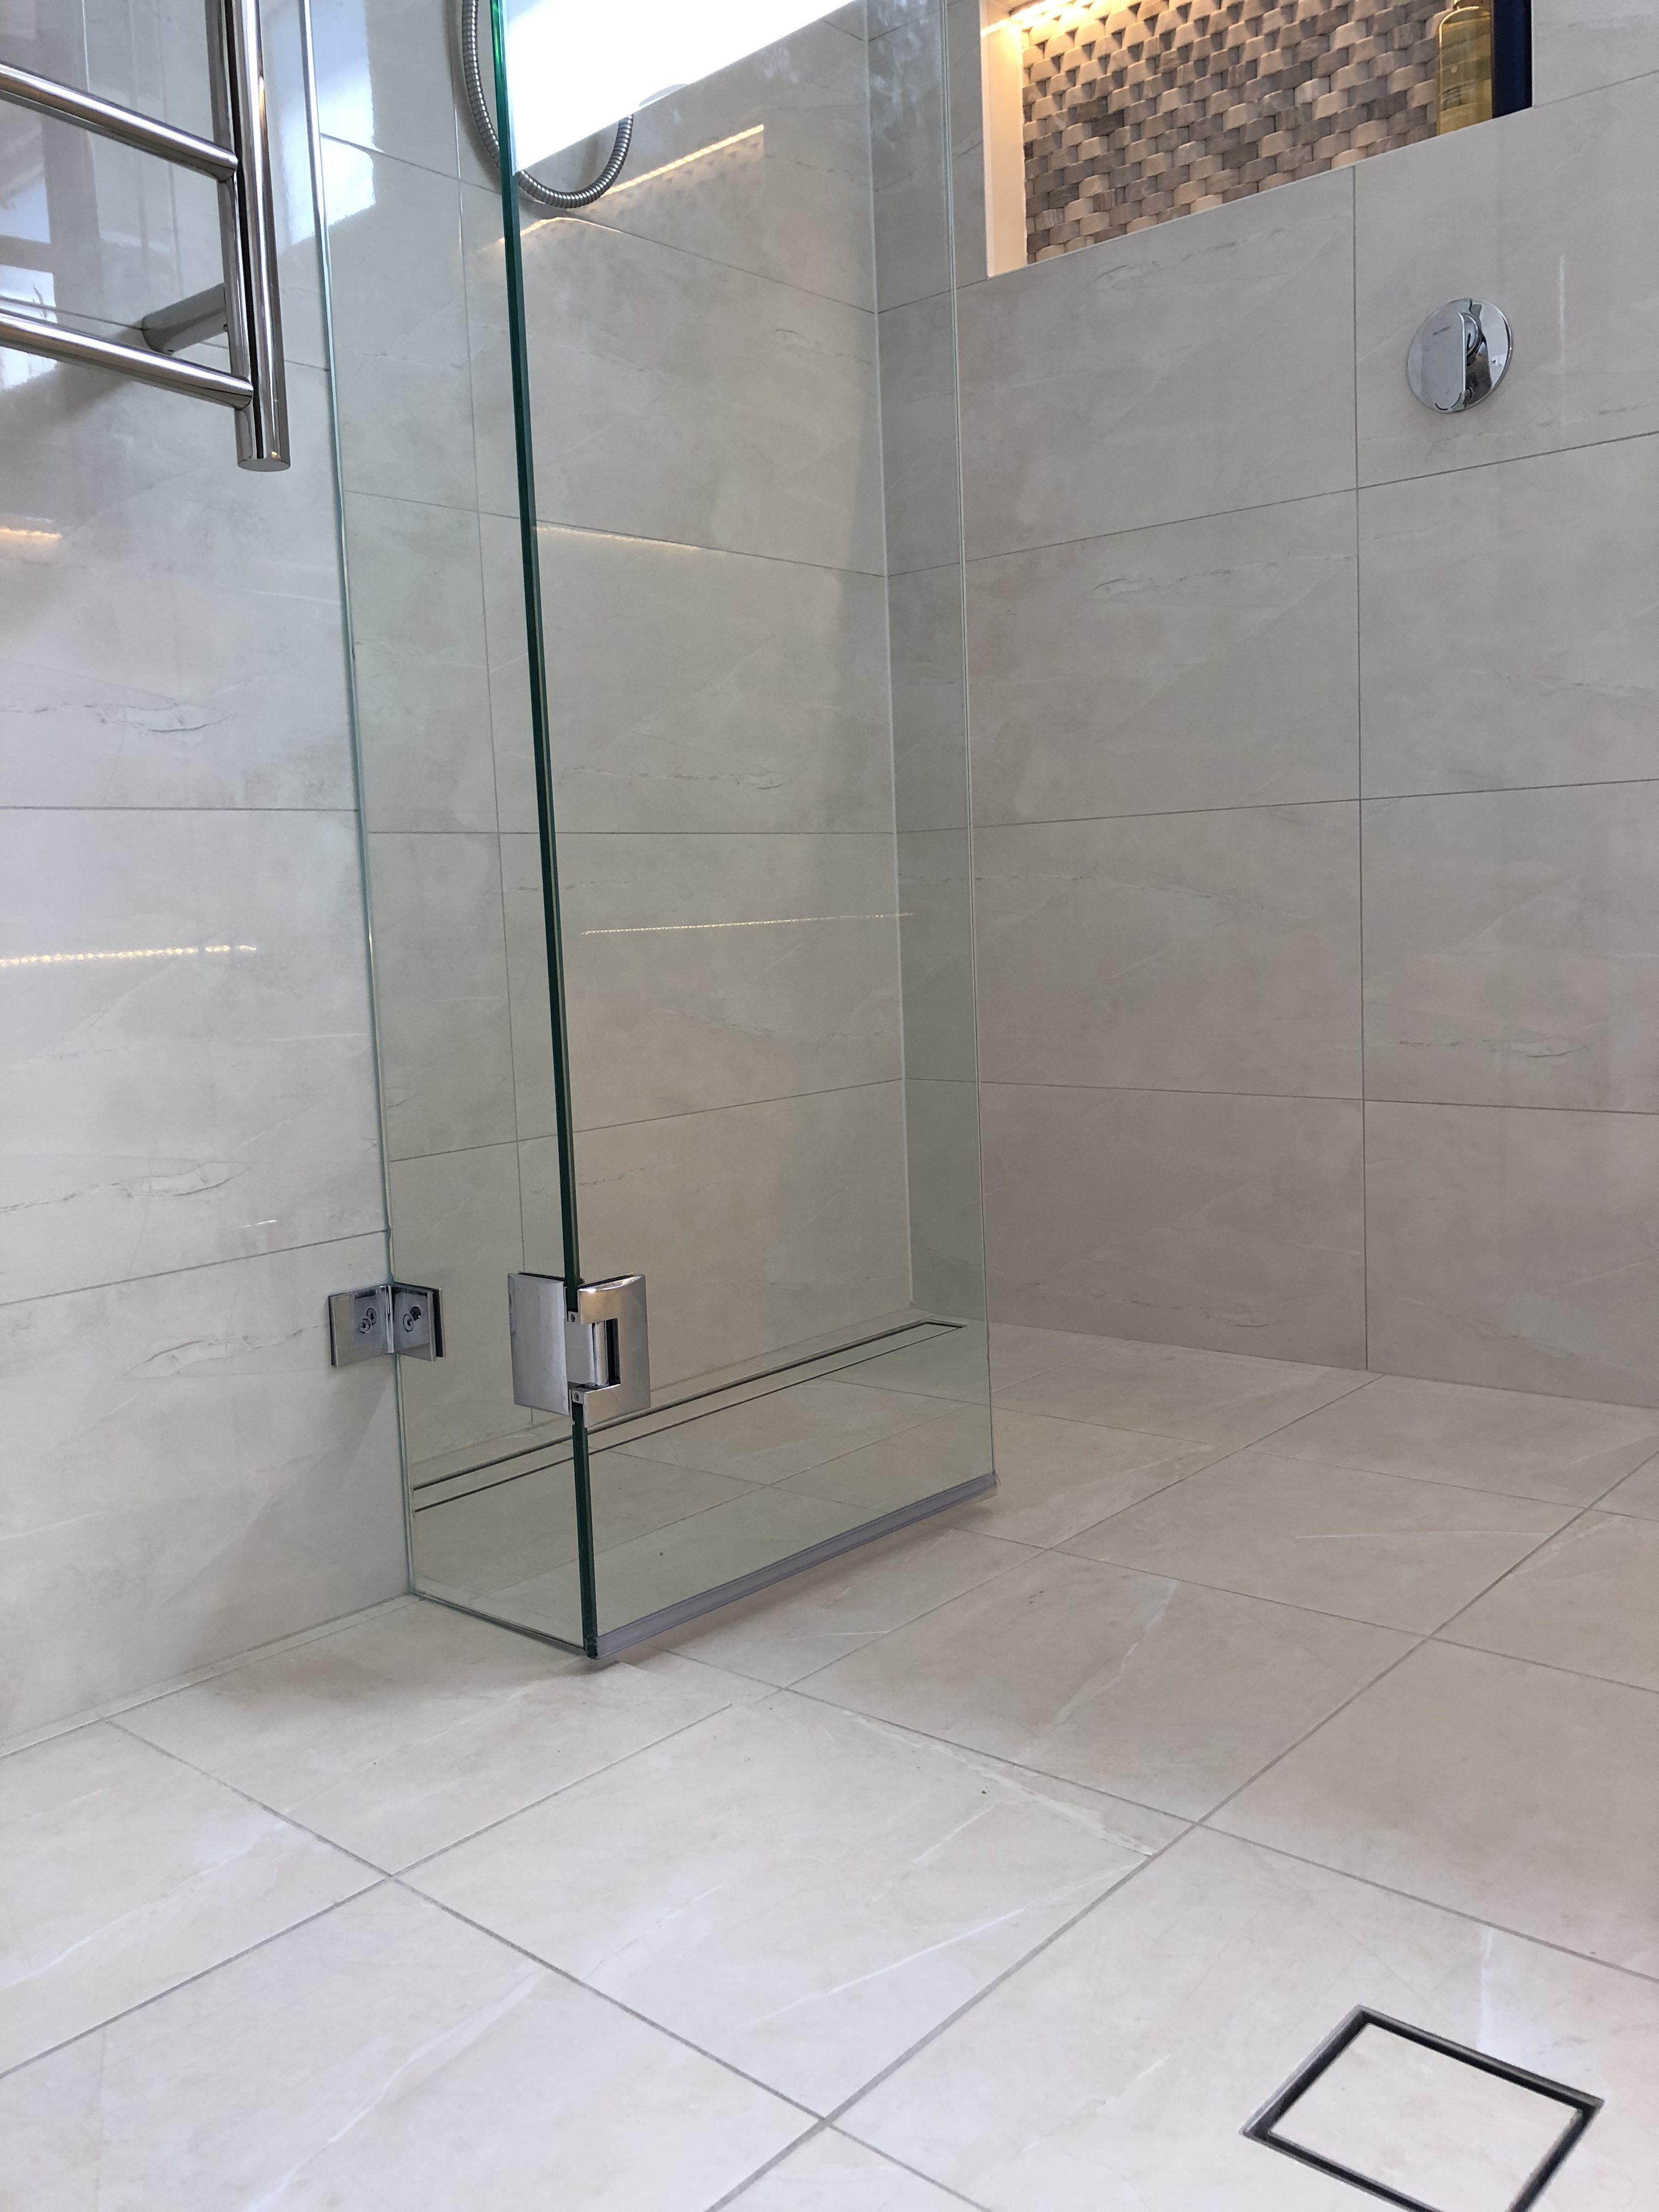 Advantages Of Linear Shower Drains